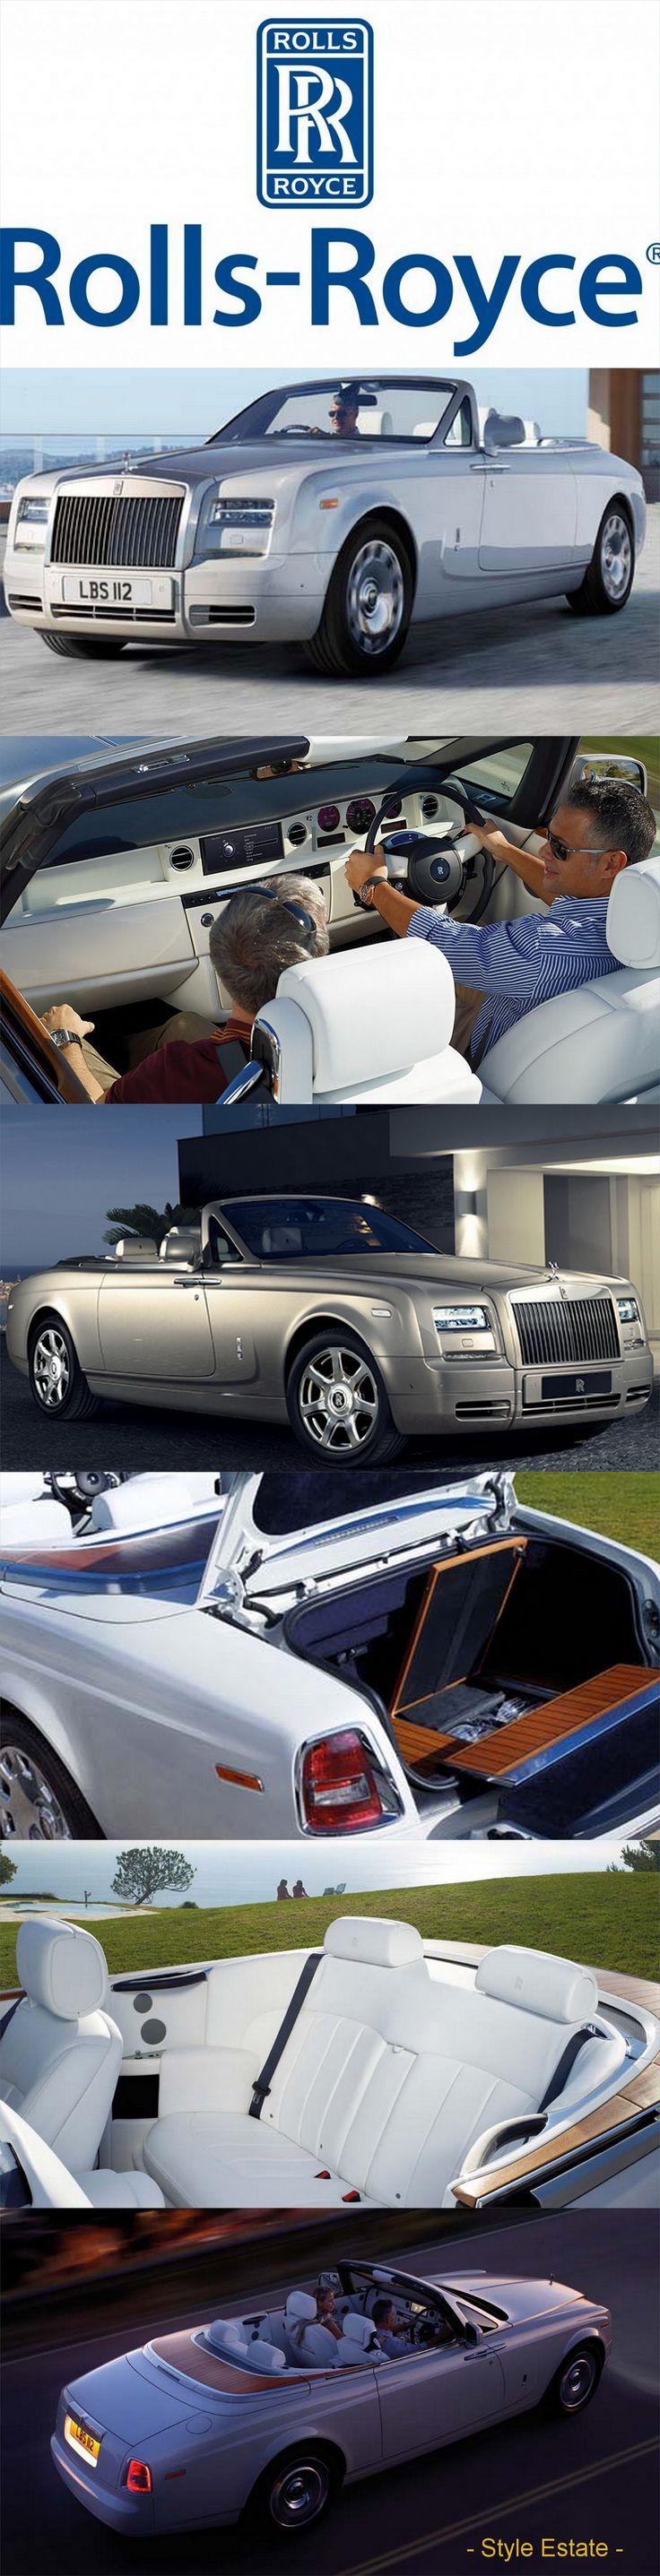 Rolls-Royce Phantom Drophead Coupé - Style Estate -